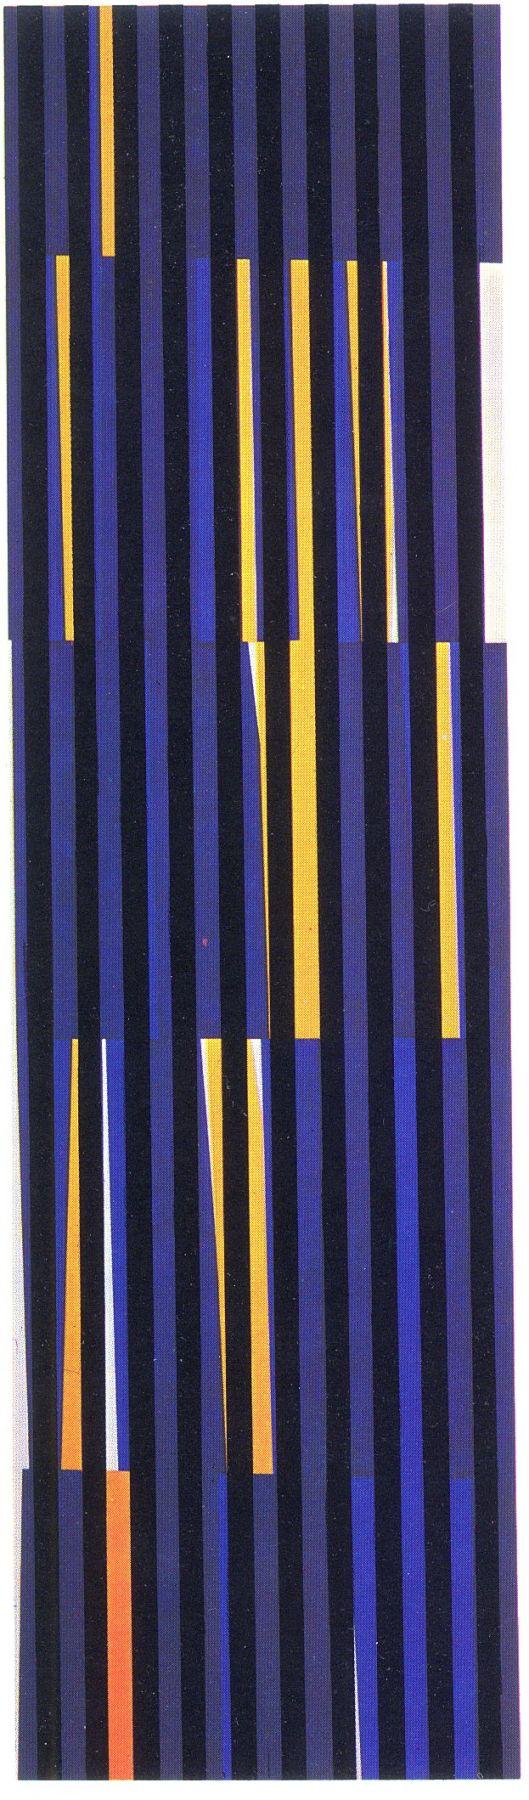 Alejandro Otero, Coloritmo 47 [Colorhythm 47], 1971. Industrial enamel on wood, 78 11/16 x 22 in. (200 x 56 cm.)